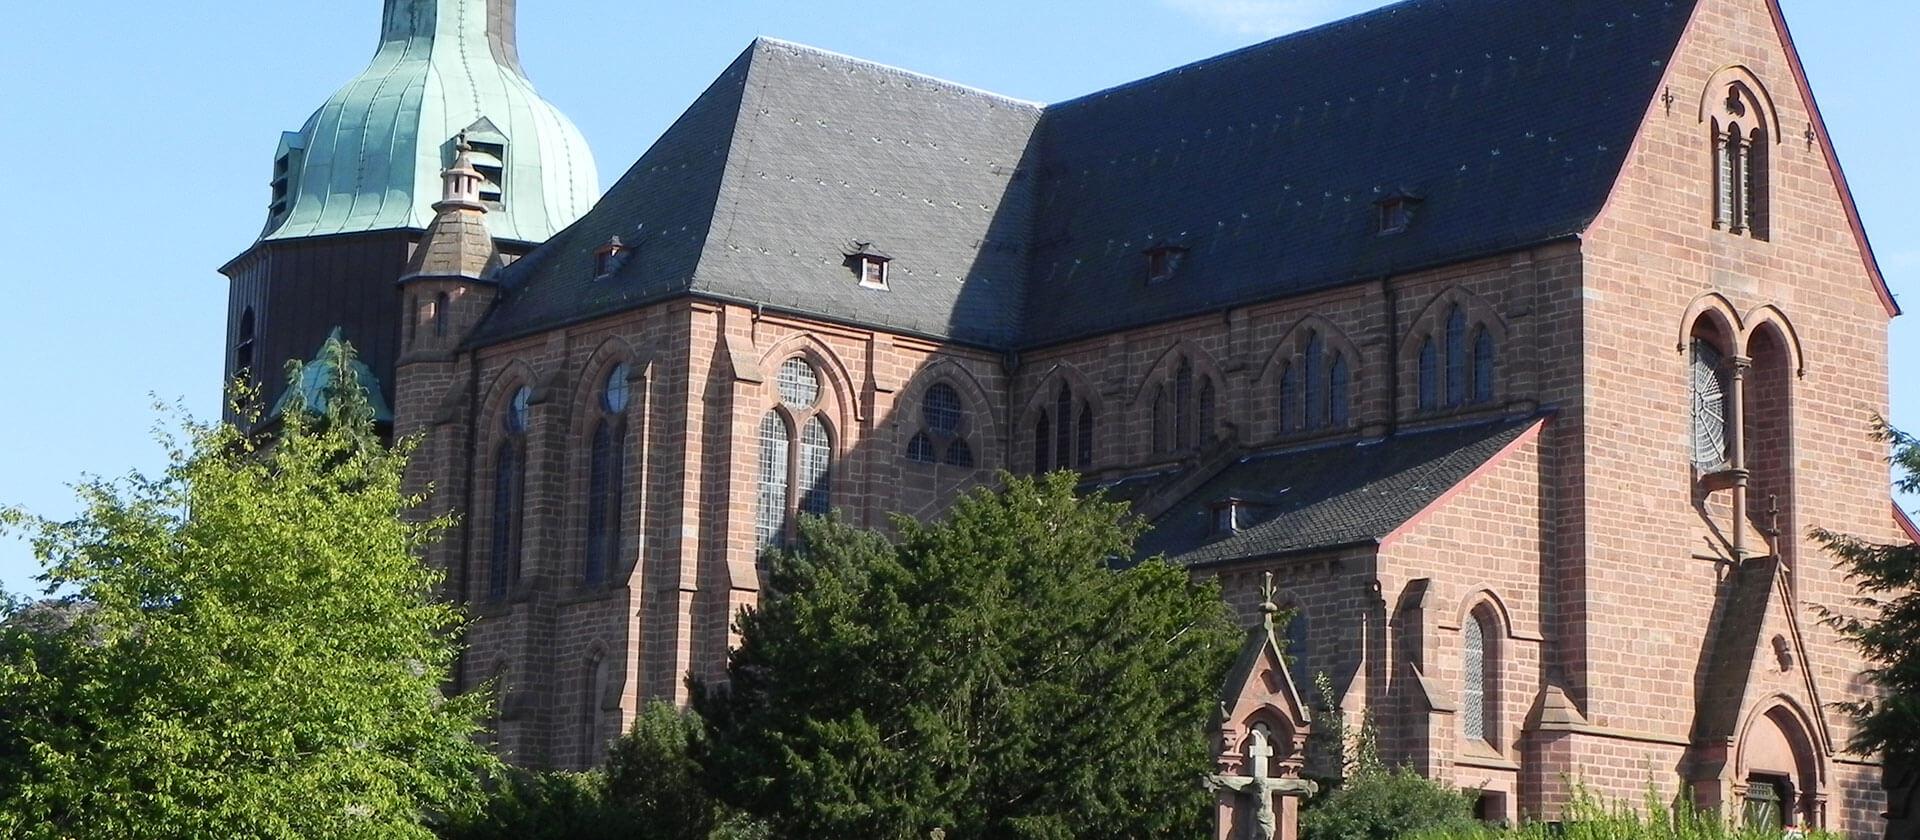 Die Stiftskirche in Amöneburg, Fotocredit Pfarrer Vogler